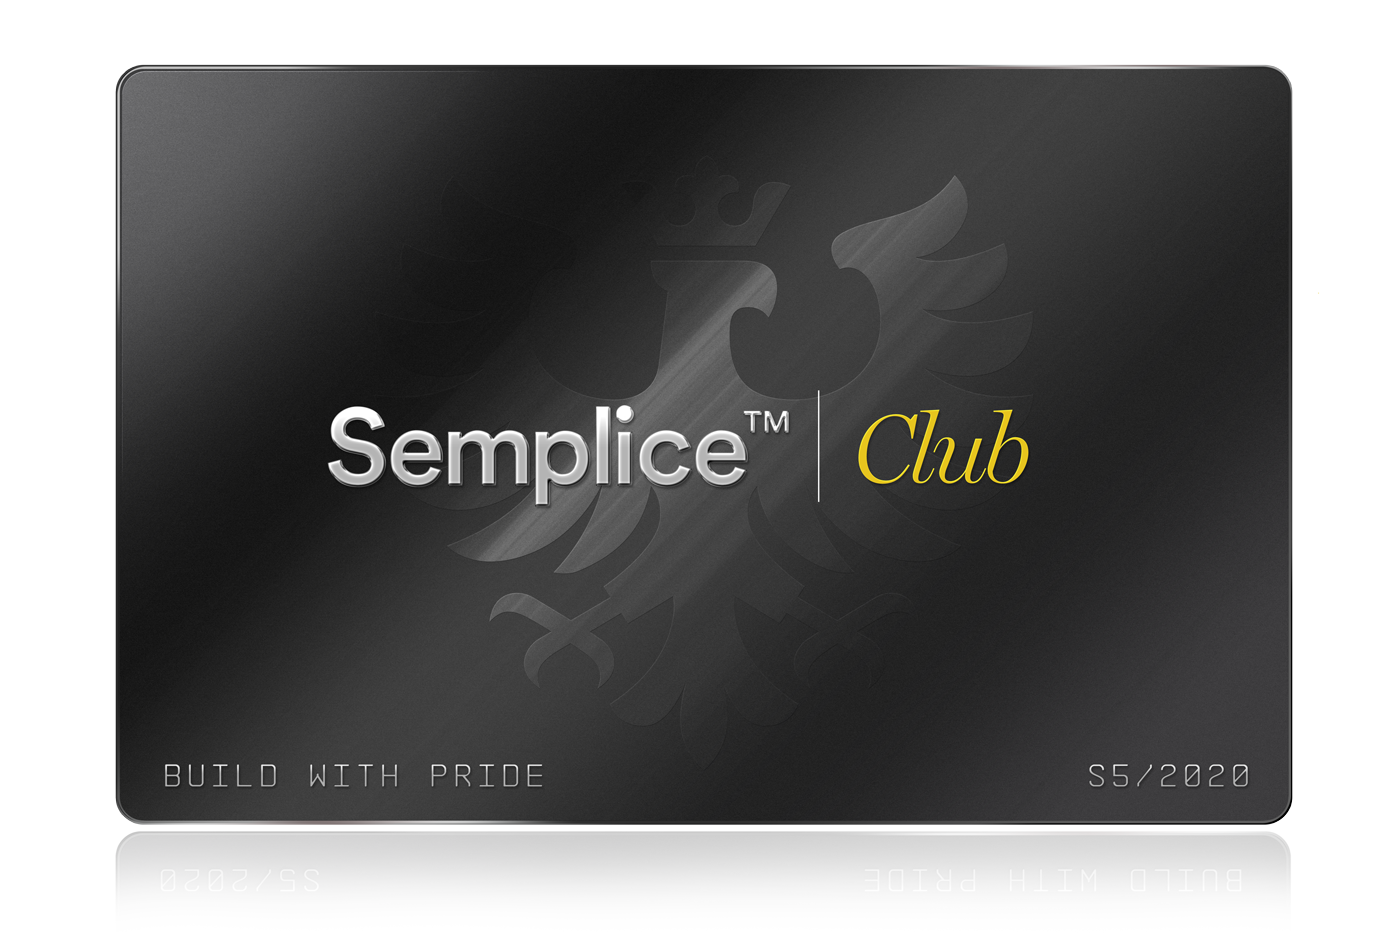 Semplice Club